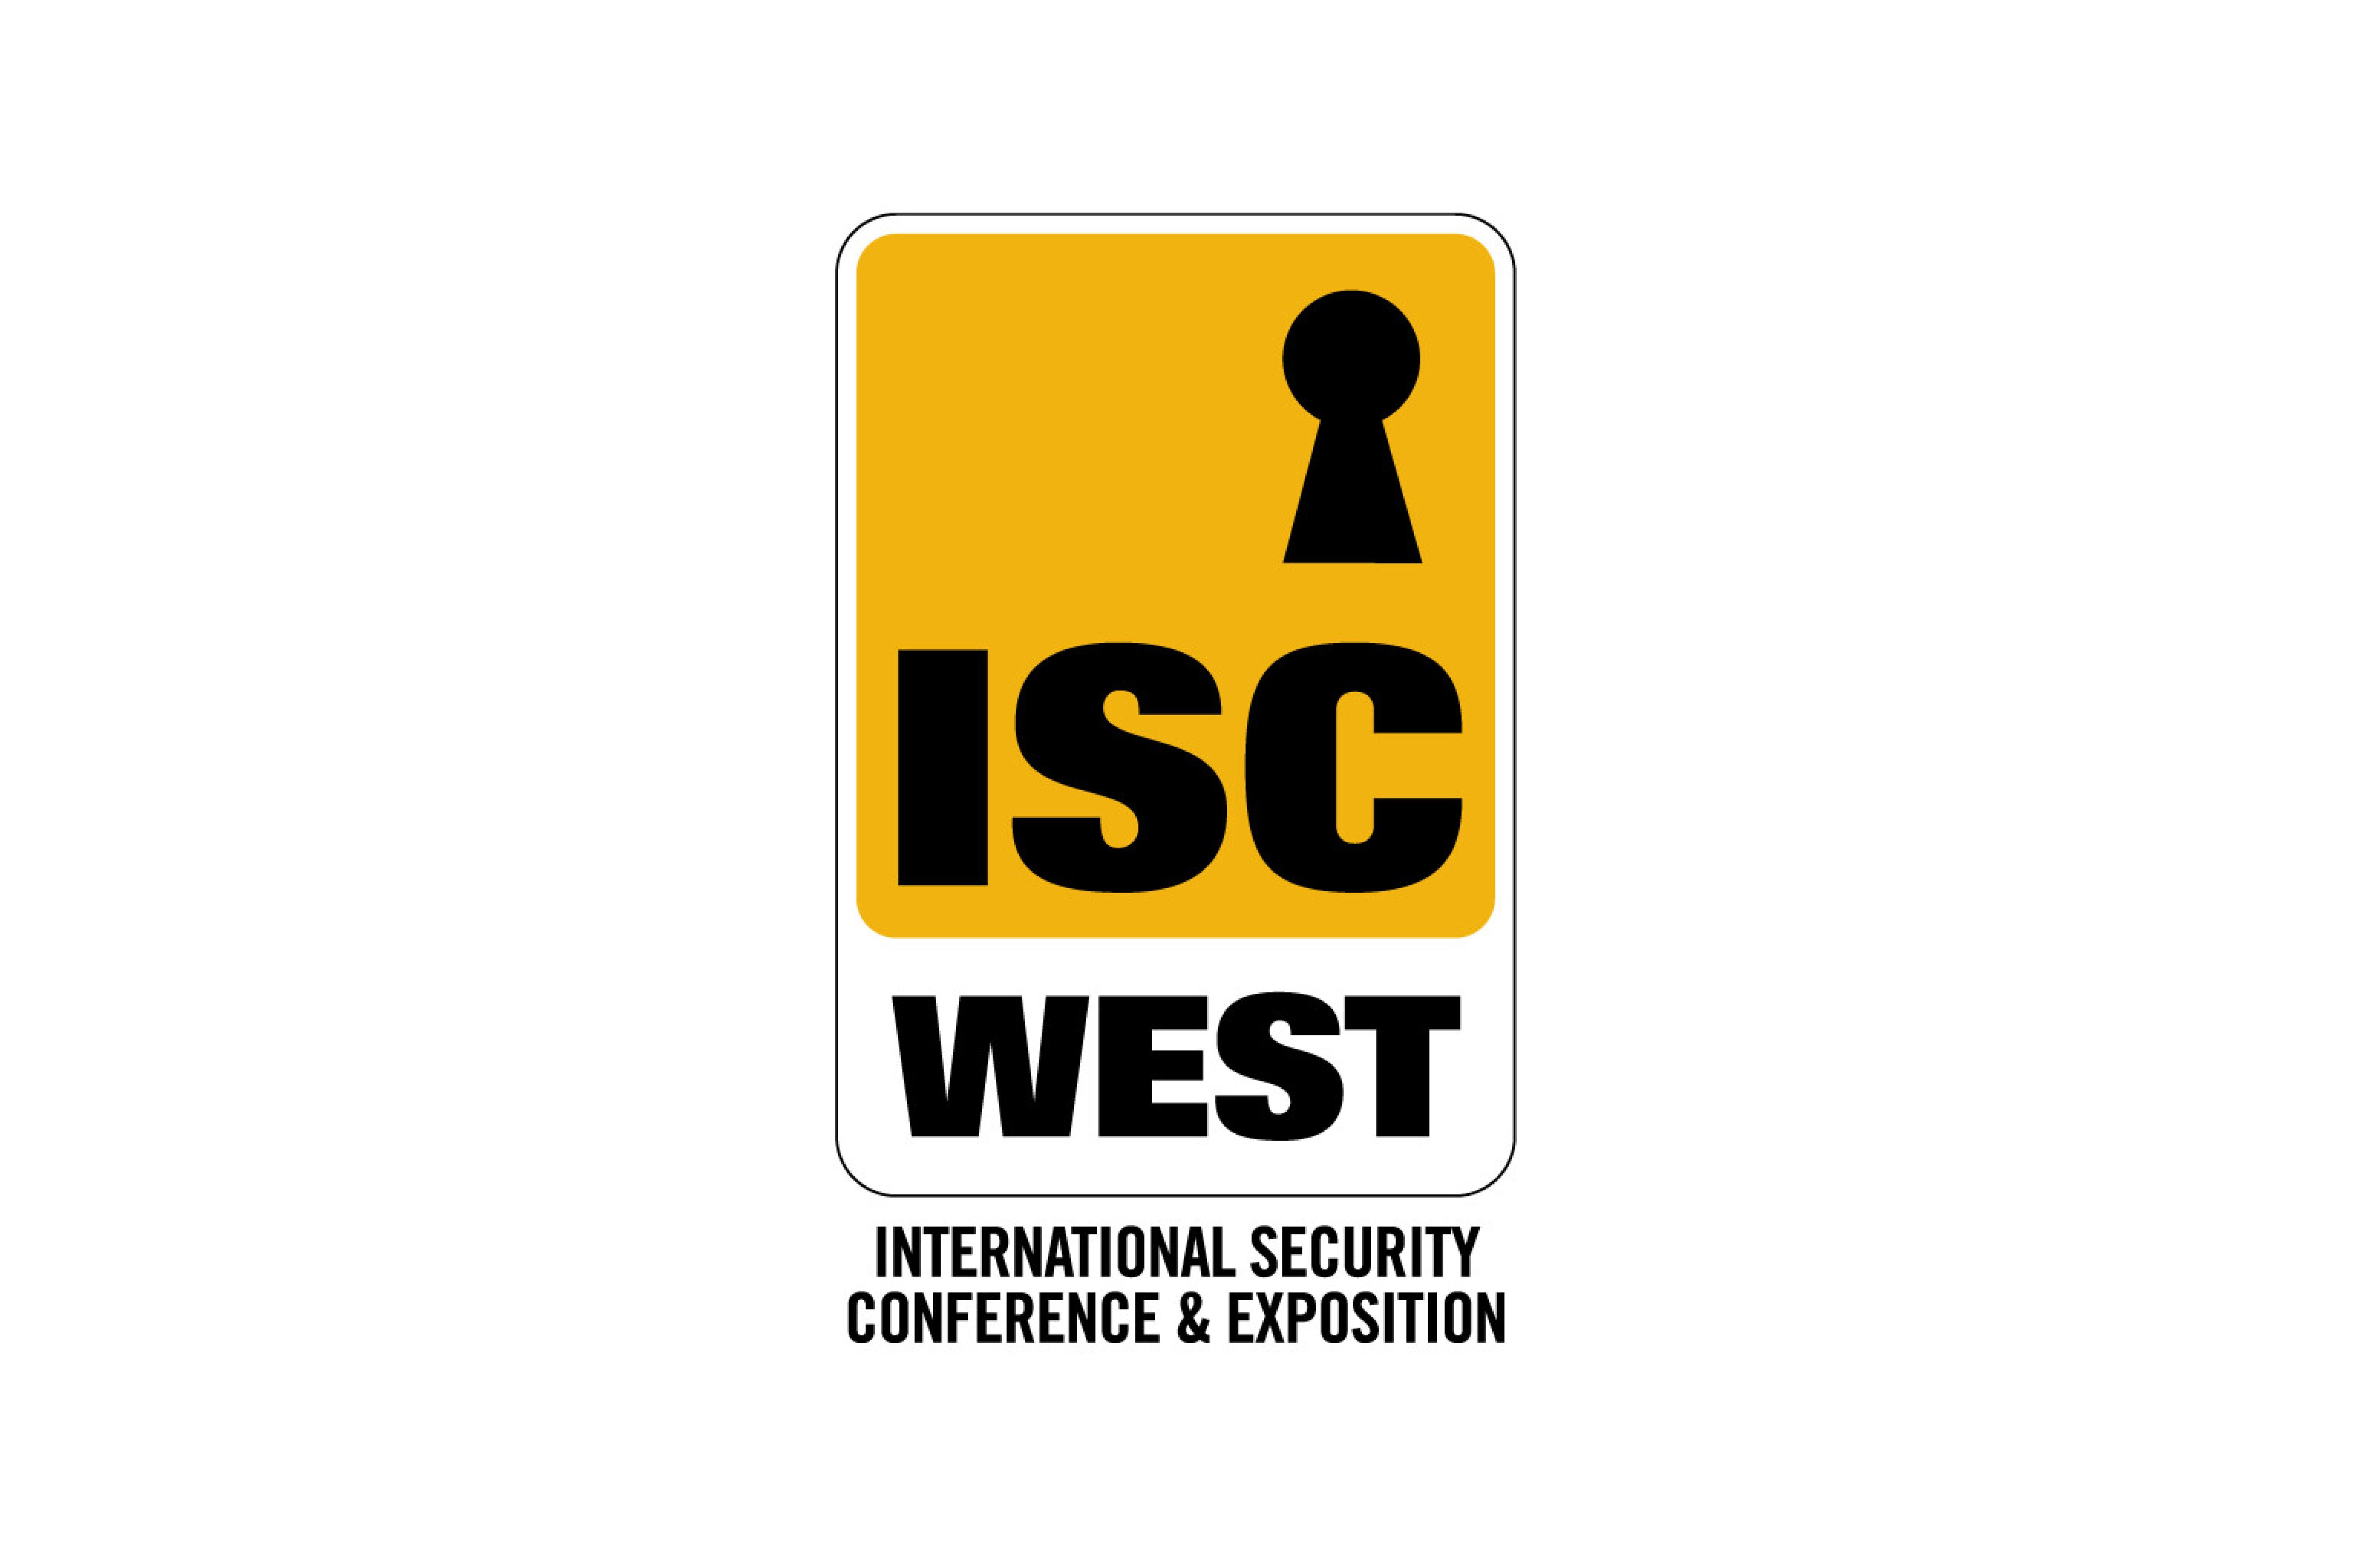 ISC West